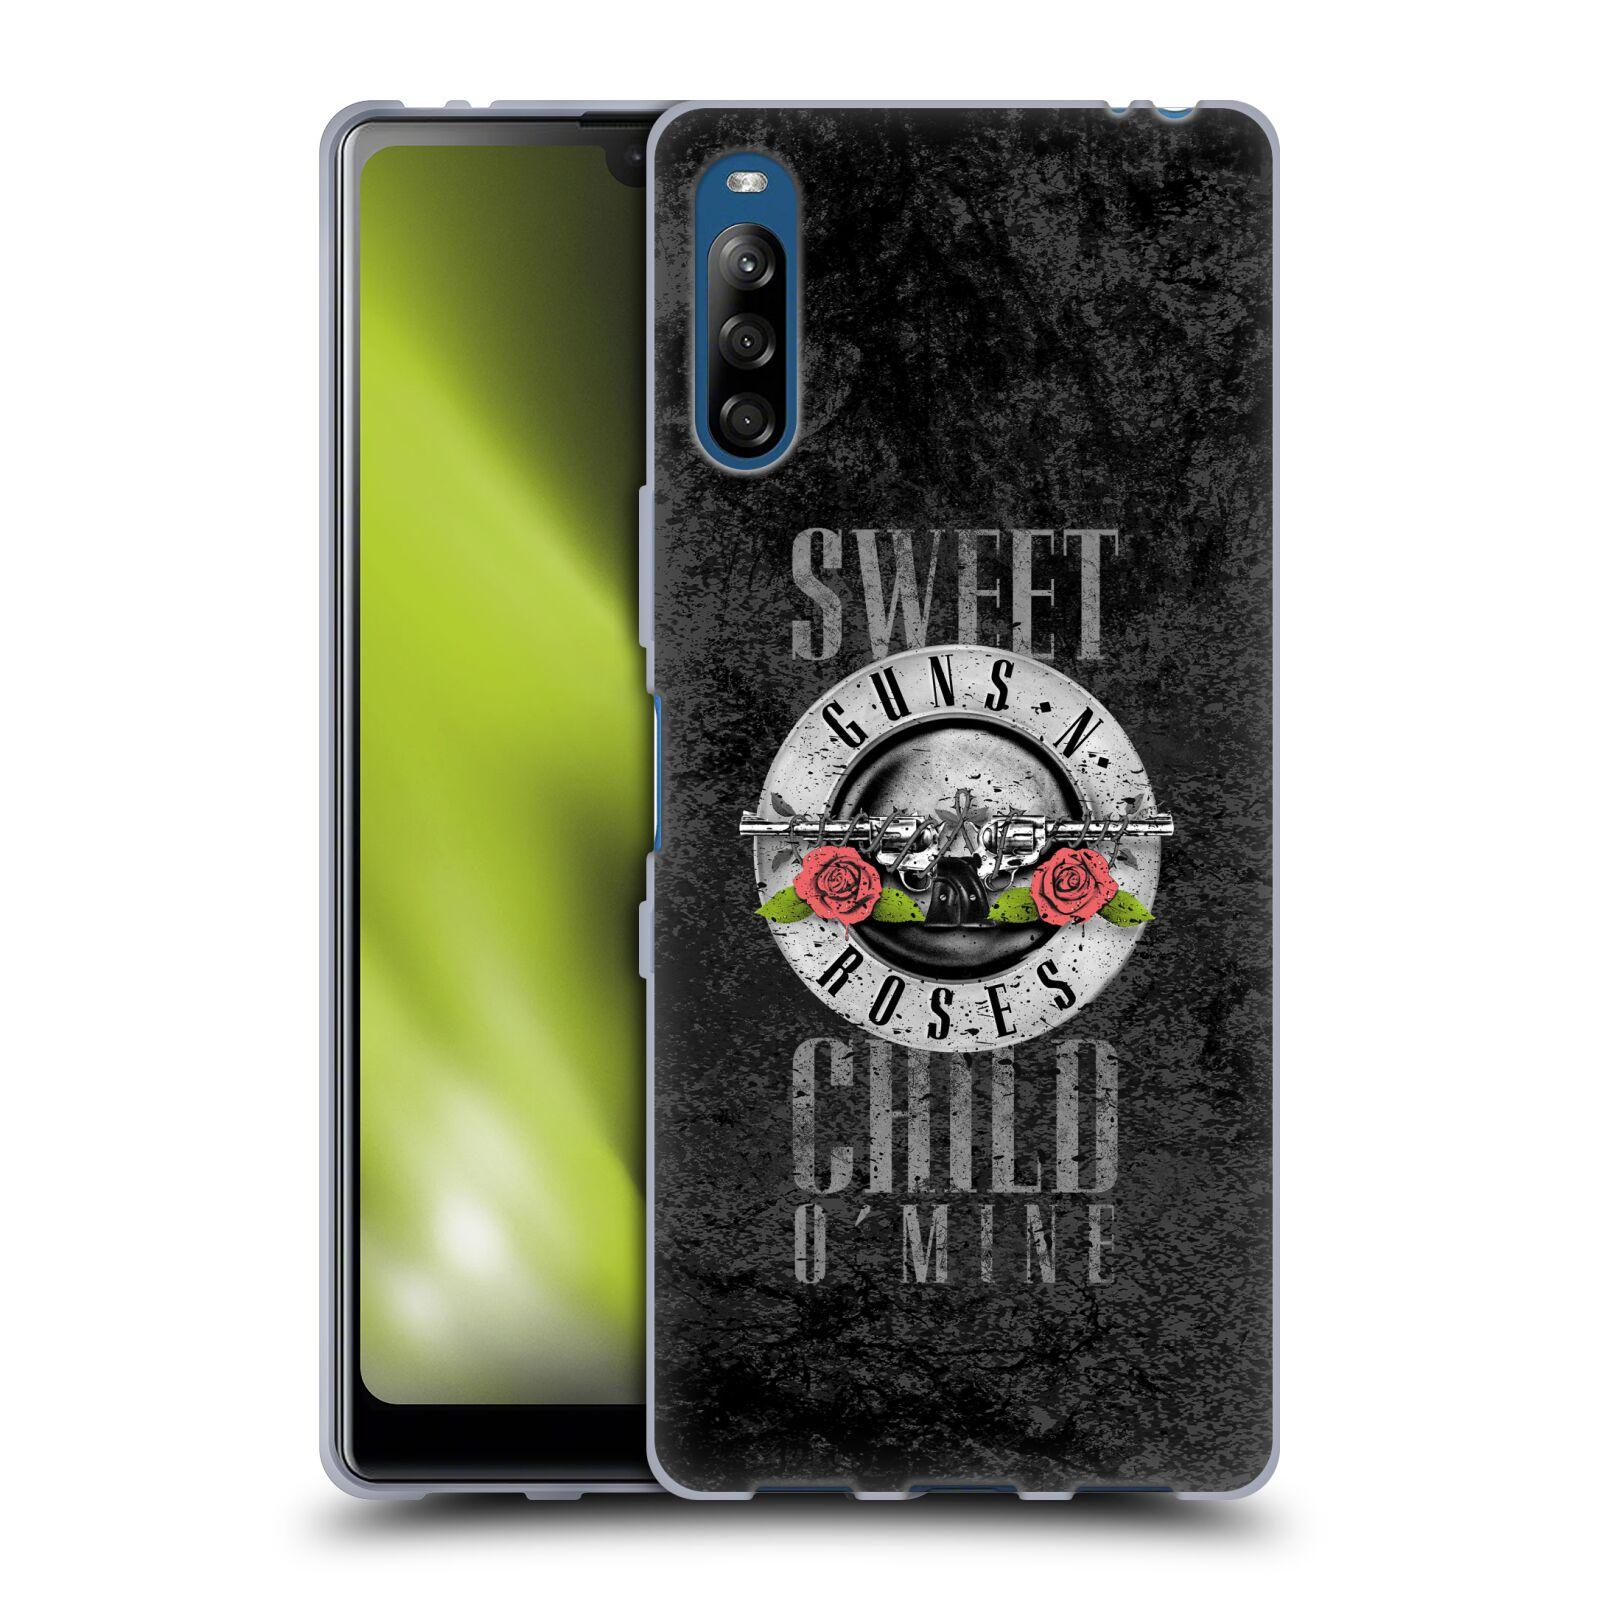 Silikonové pouzdro na mobil Sony Xperia L4 - Head Case - Guns N' Roses - Sweet Child